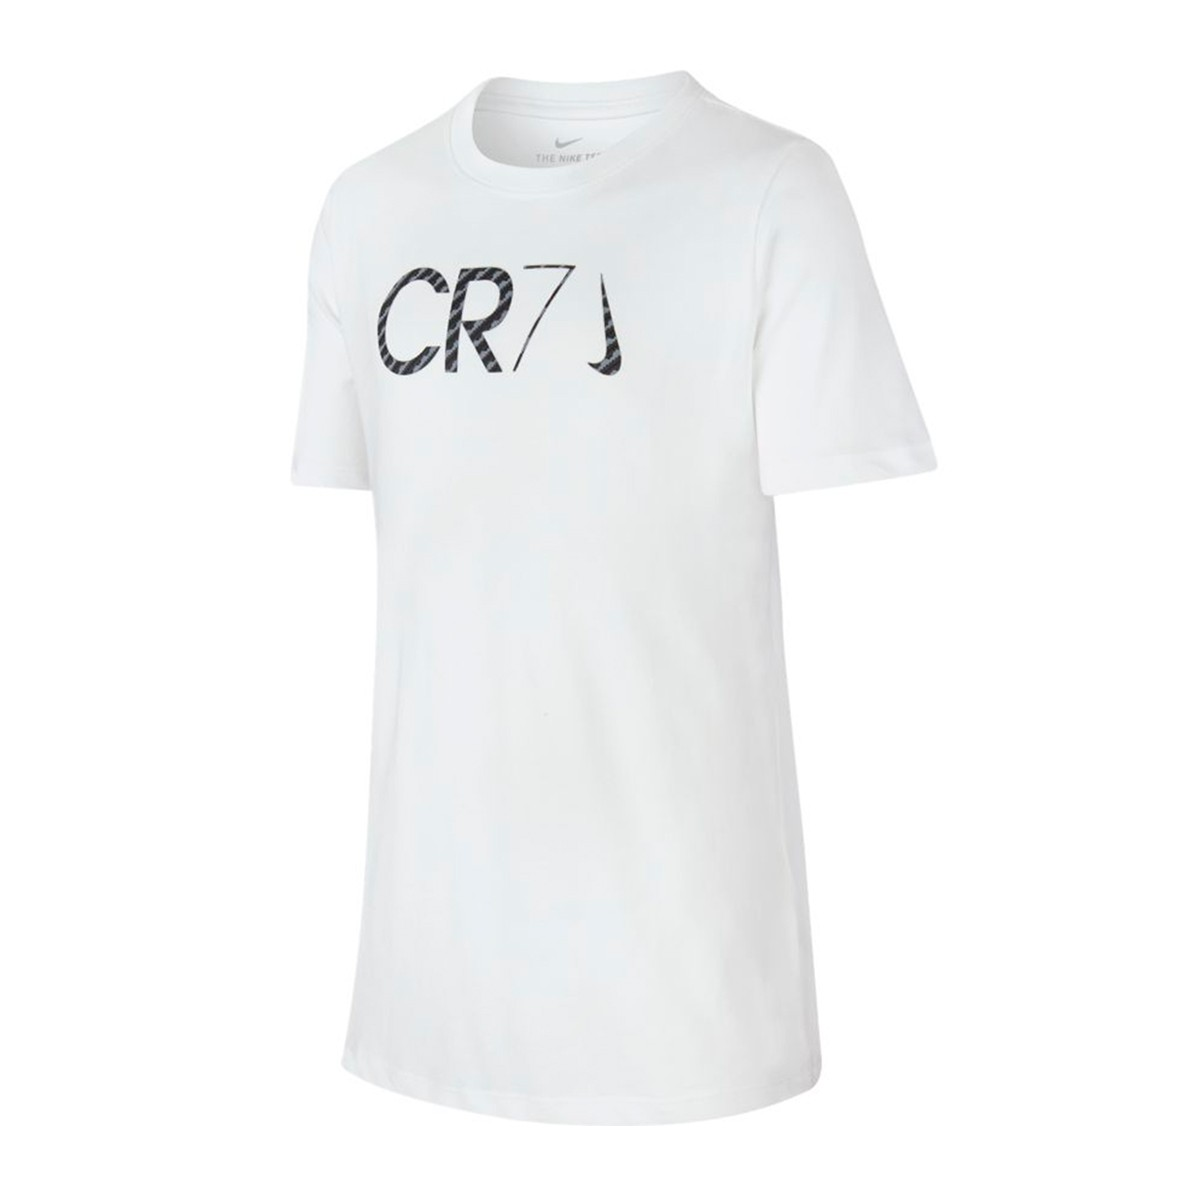 low priced 18725 2cdbd Camiseta Dry CR7 Chapter 7 Niño White